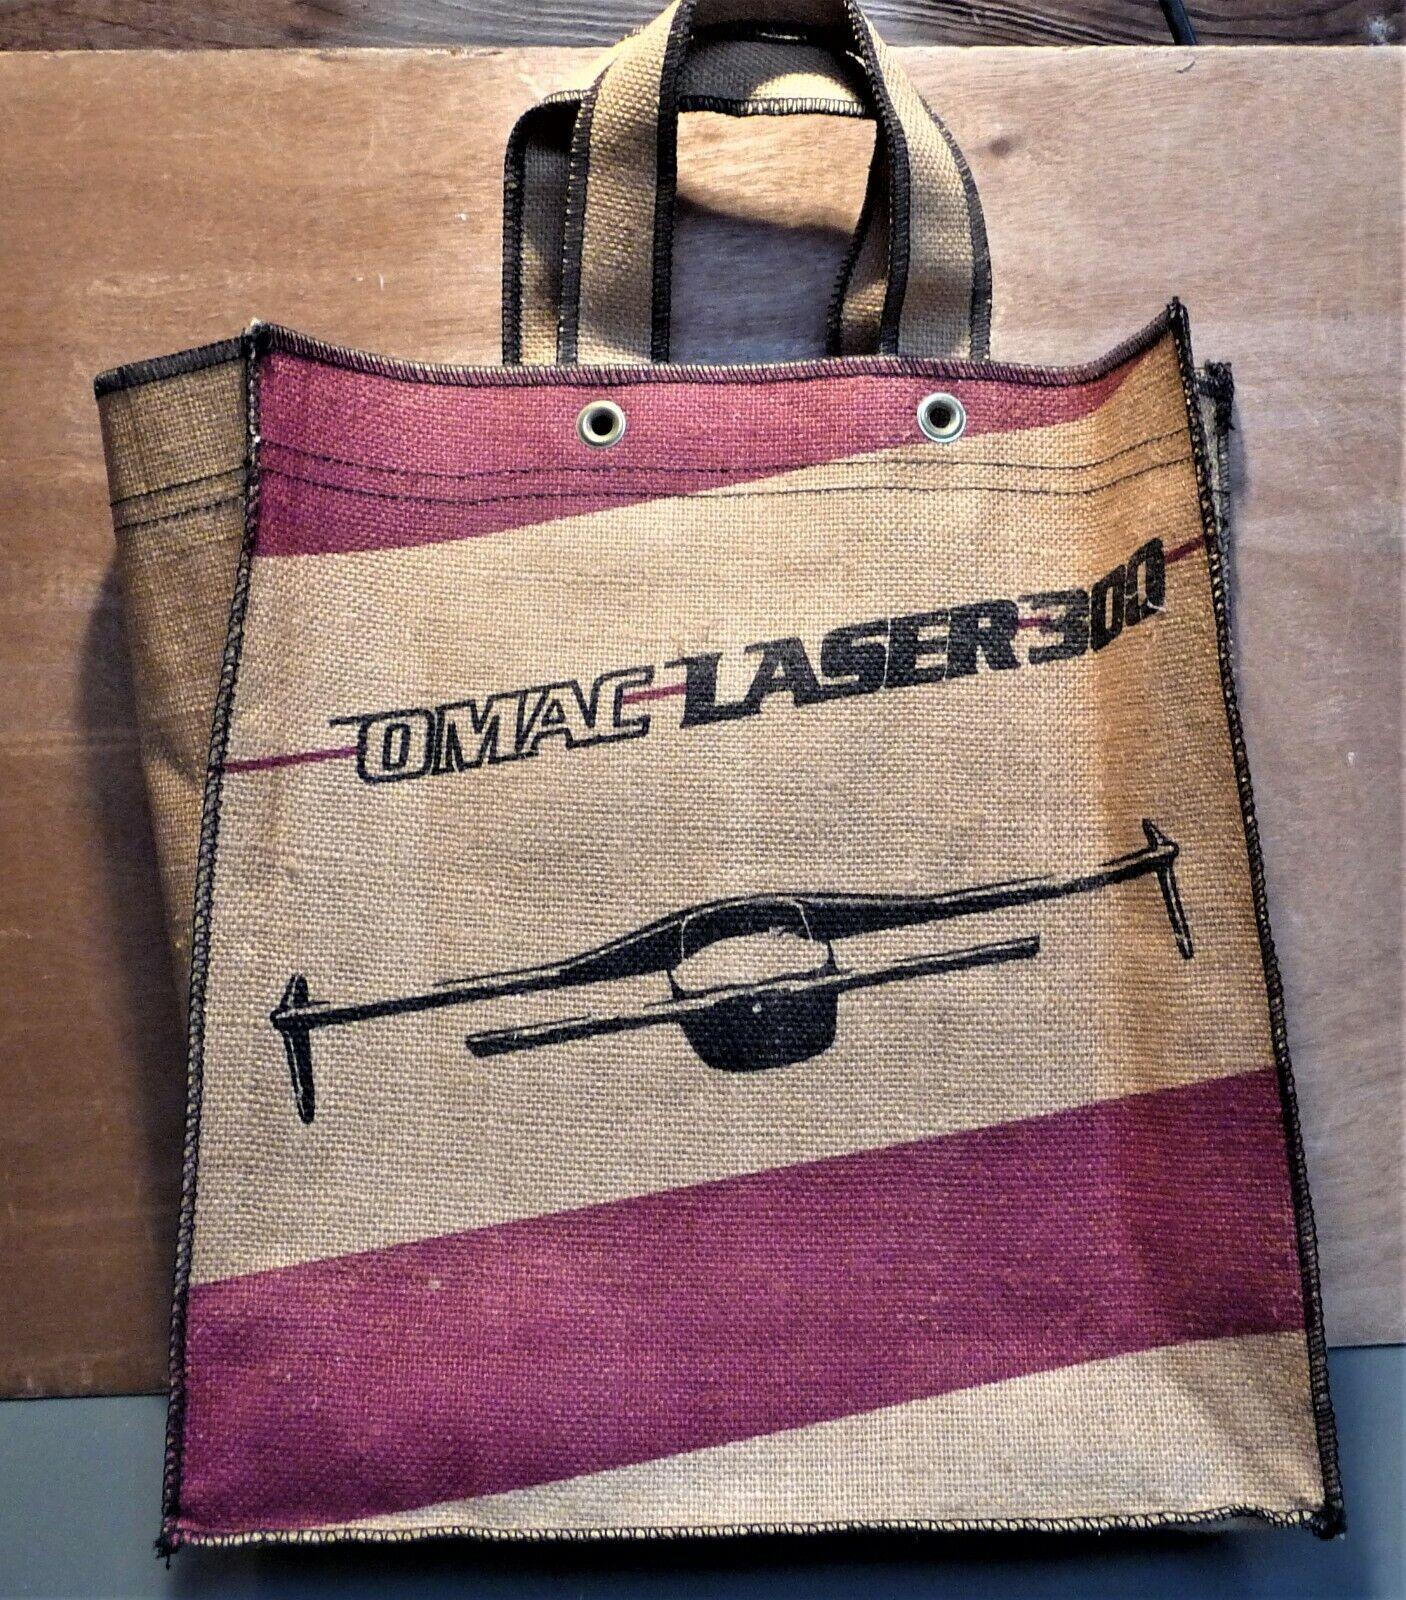 Albany Georgia Omac Laser 300 Aircraft Manufacturing Collectible Burlap Tote Bag